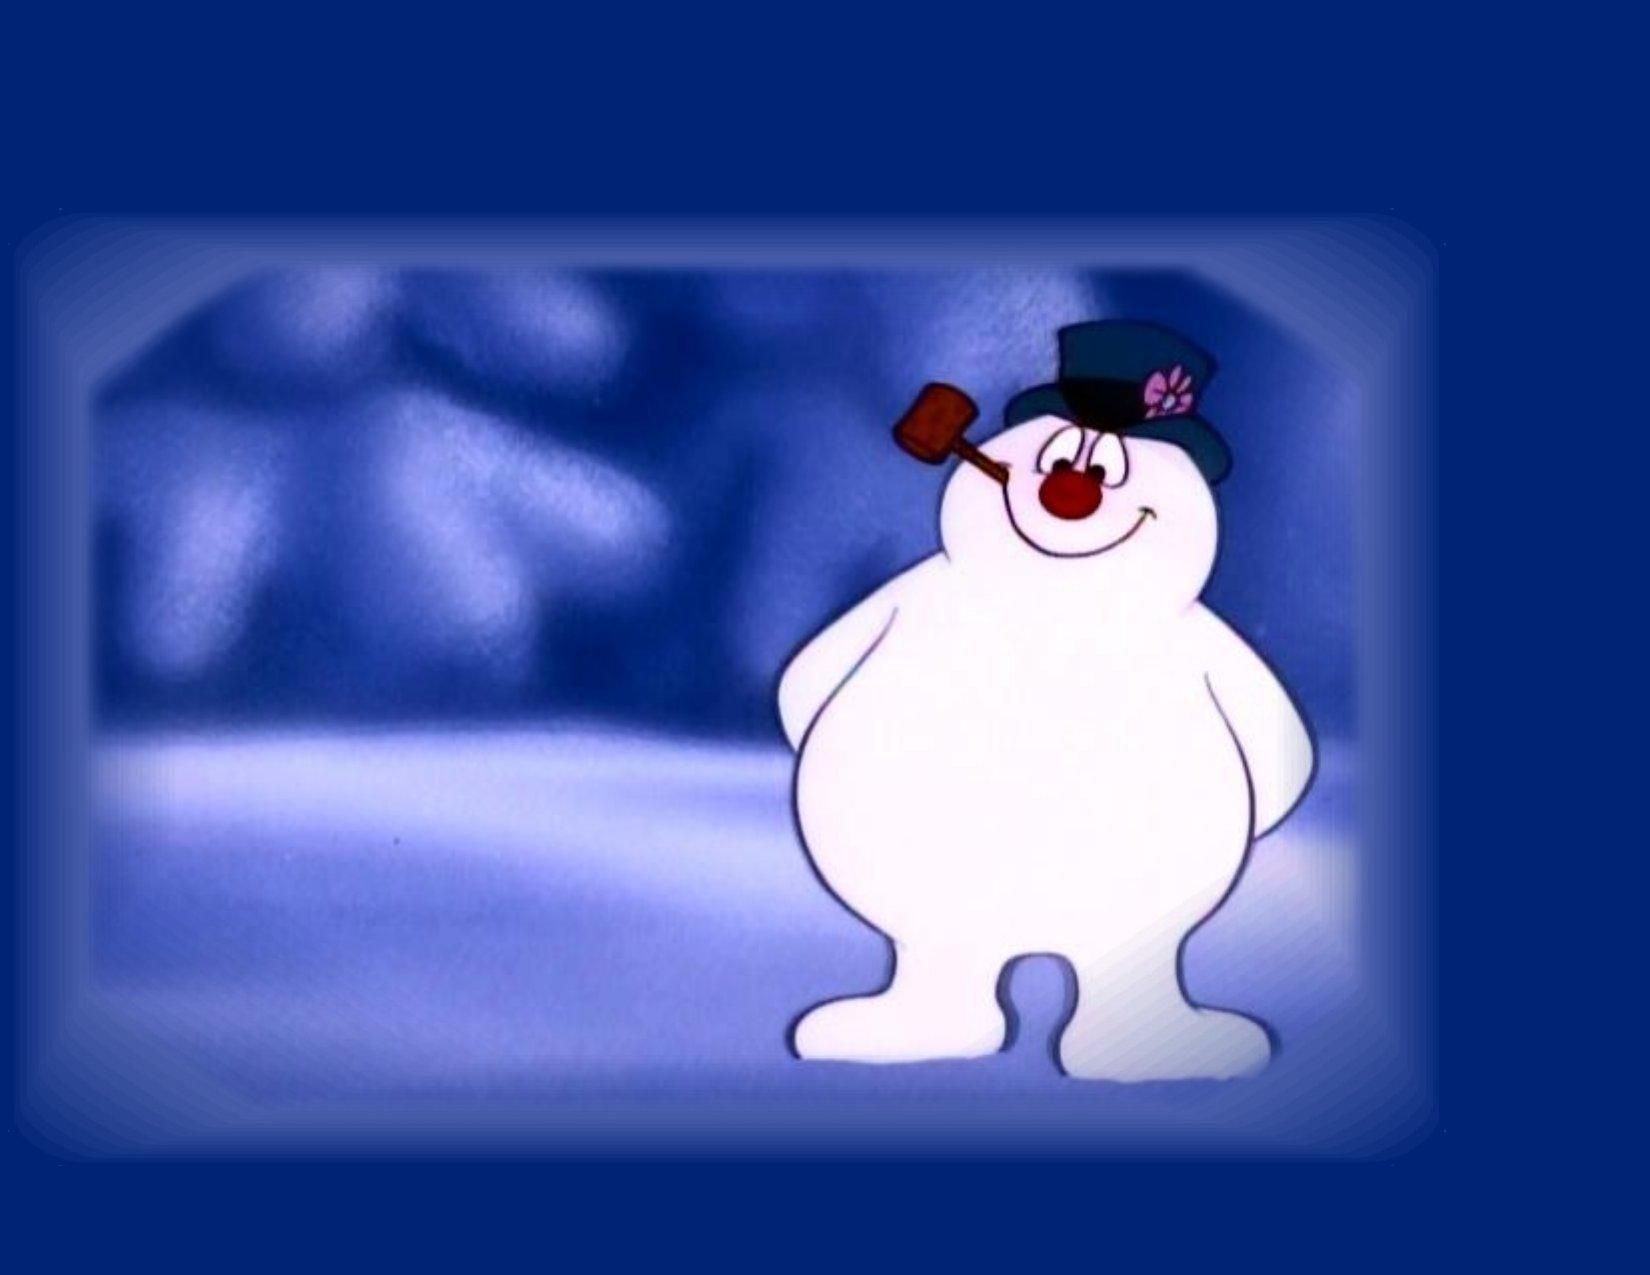 66 Frosty The Snowman Wallpaper On Wallpapersafari